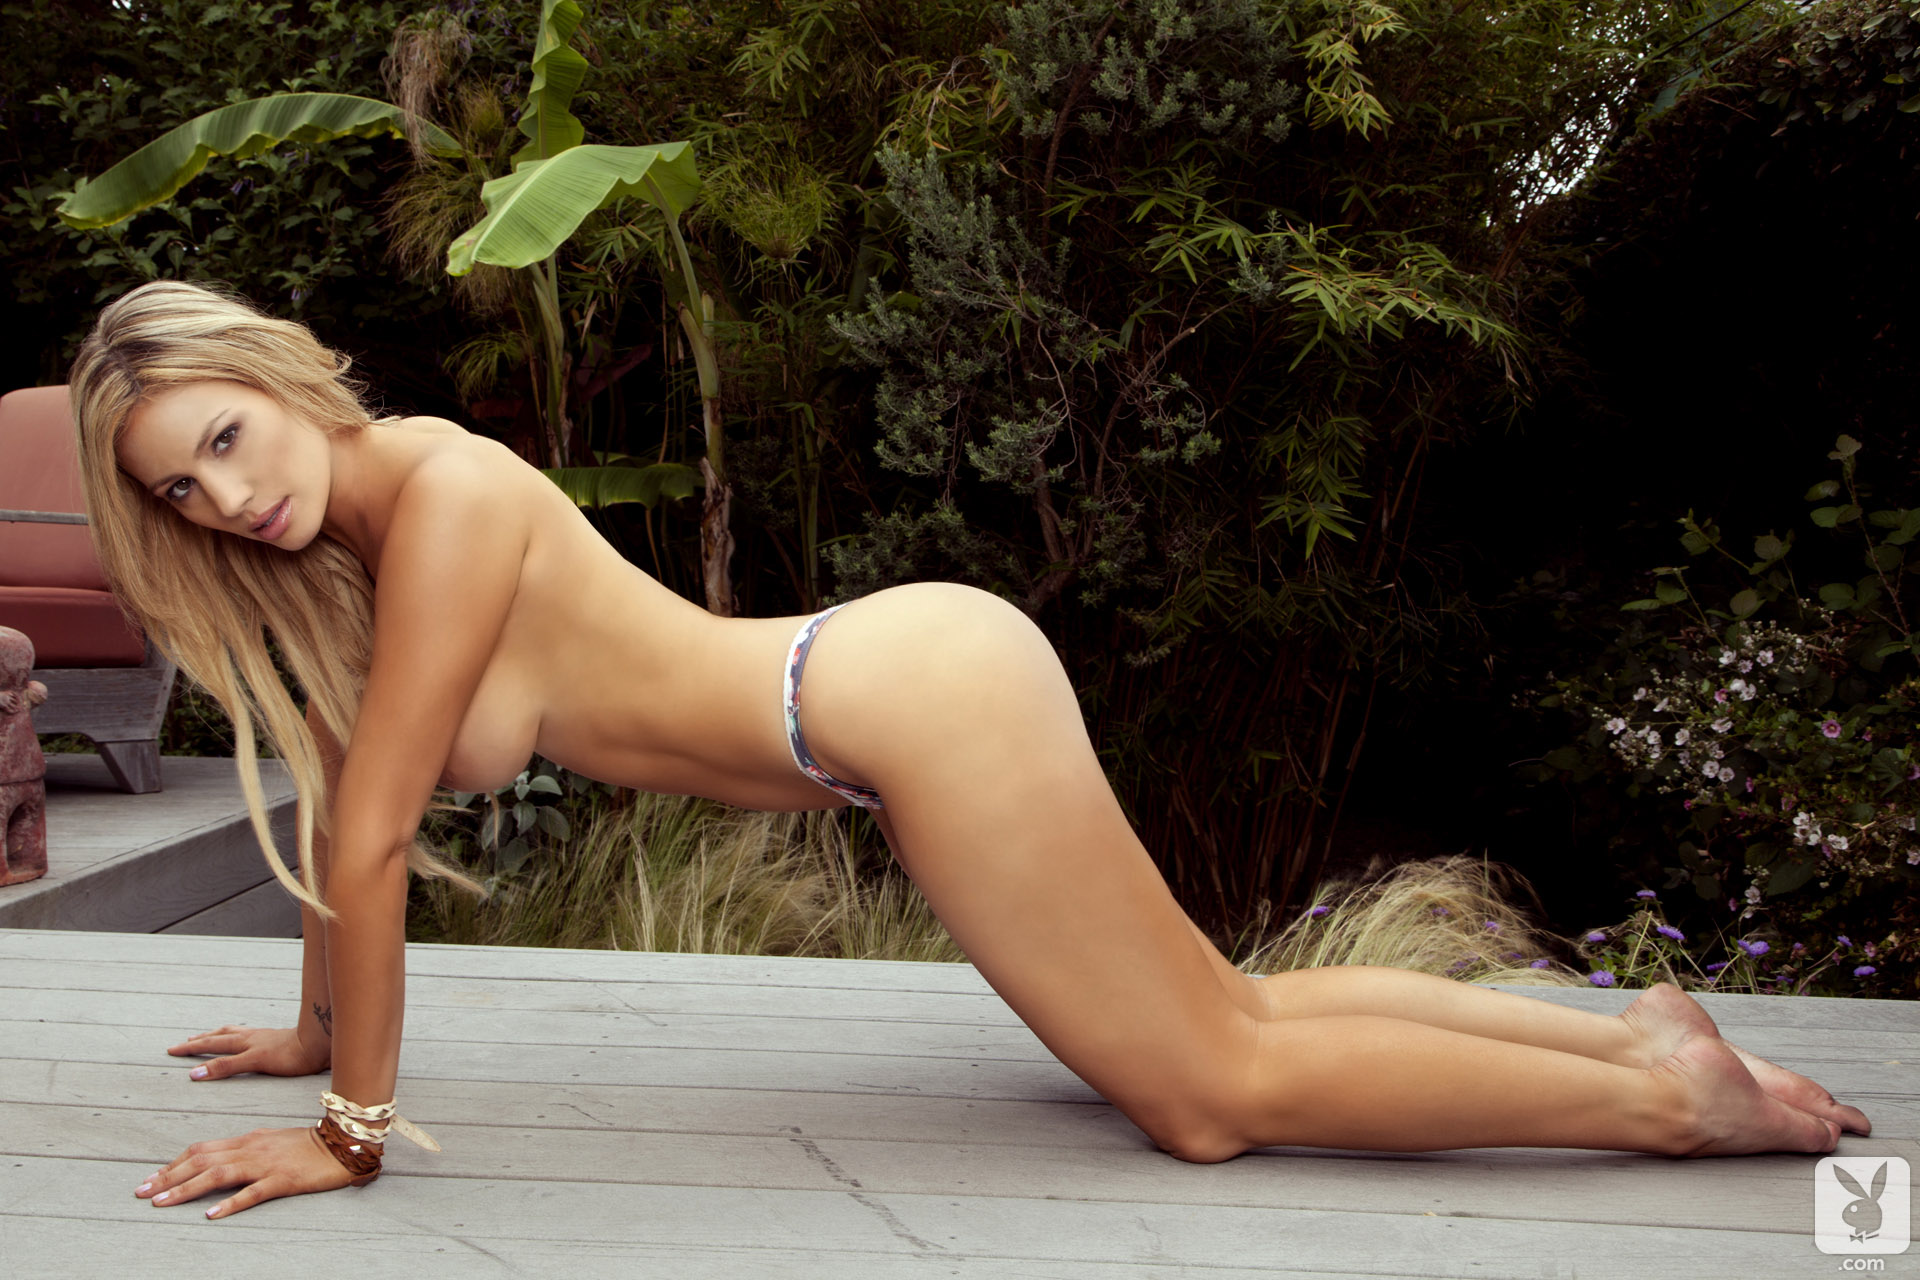 girls public nudity